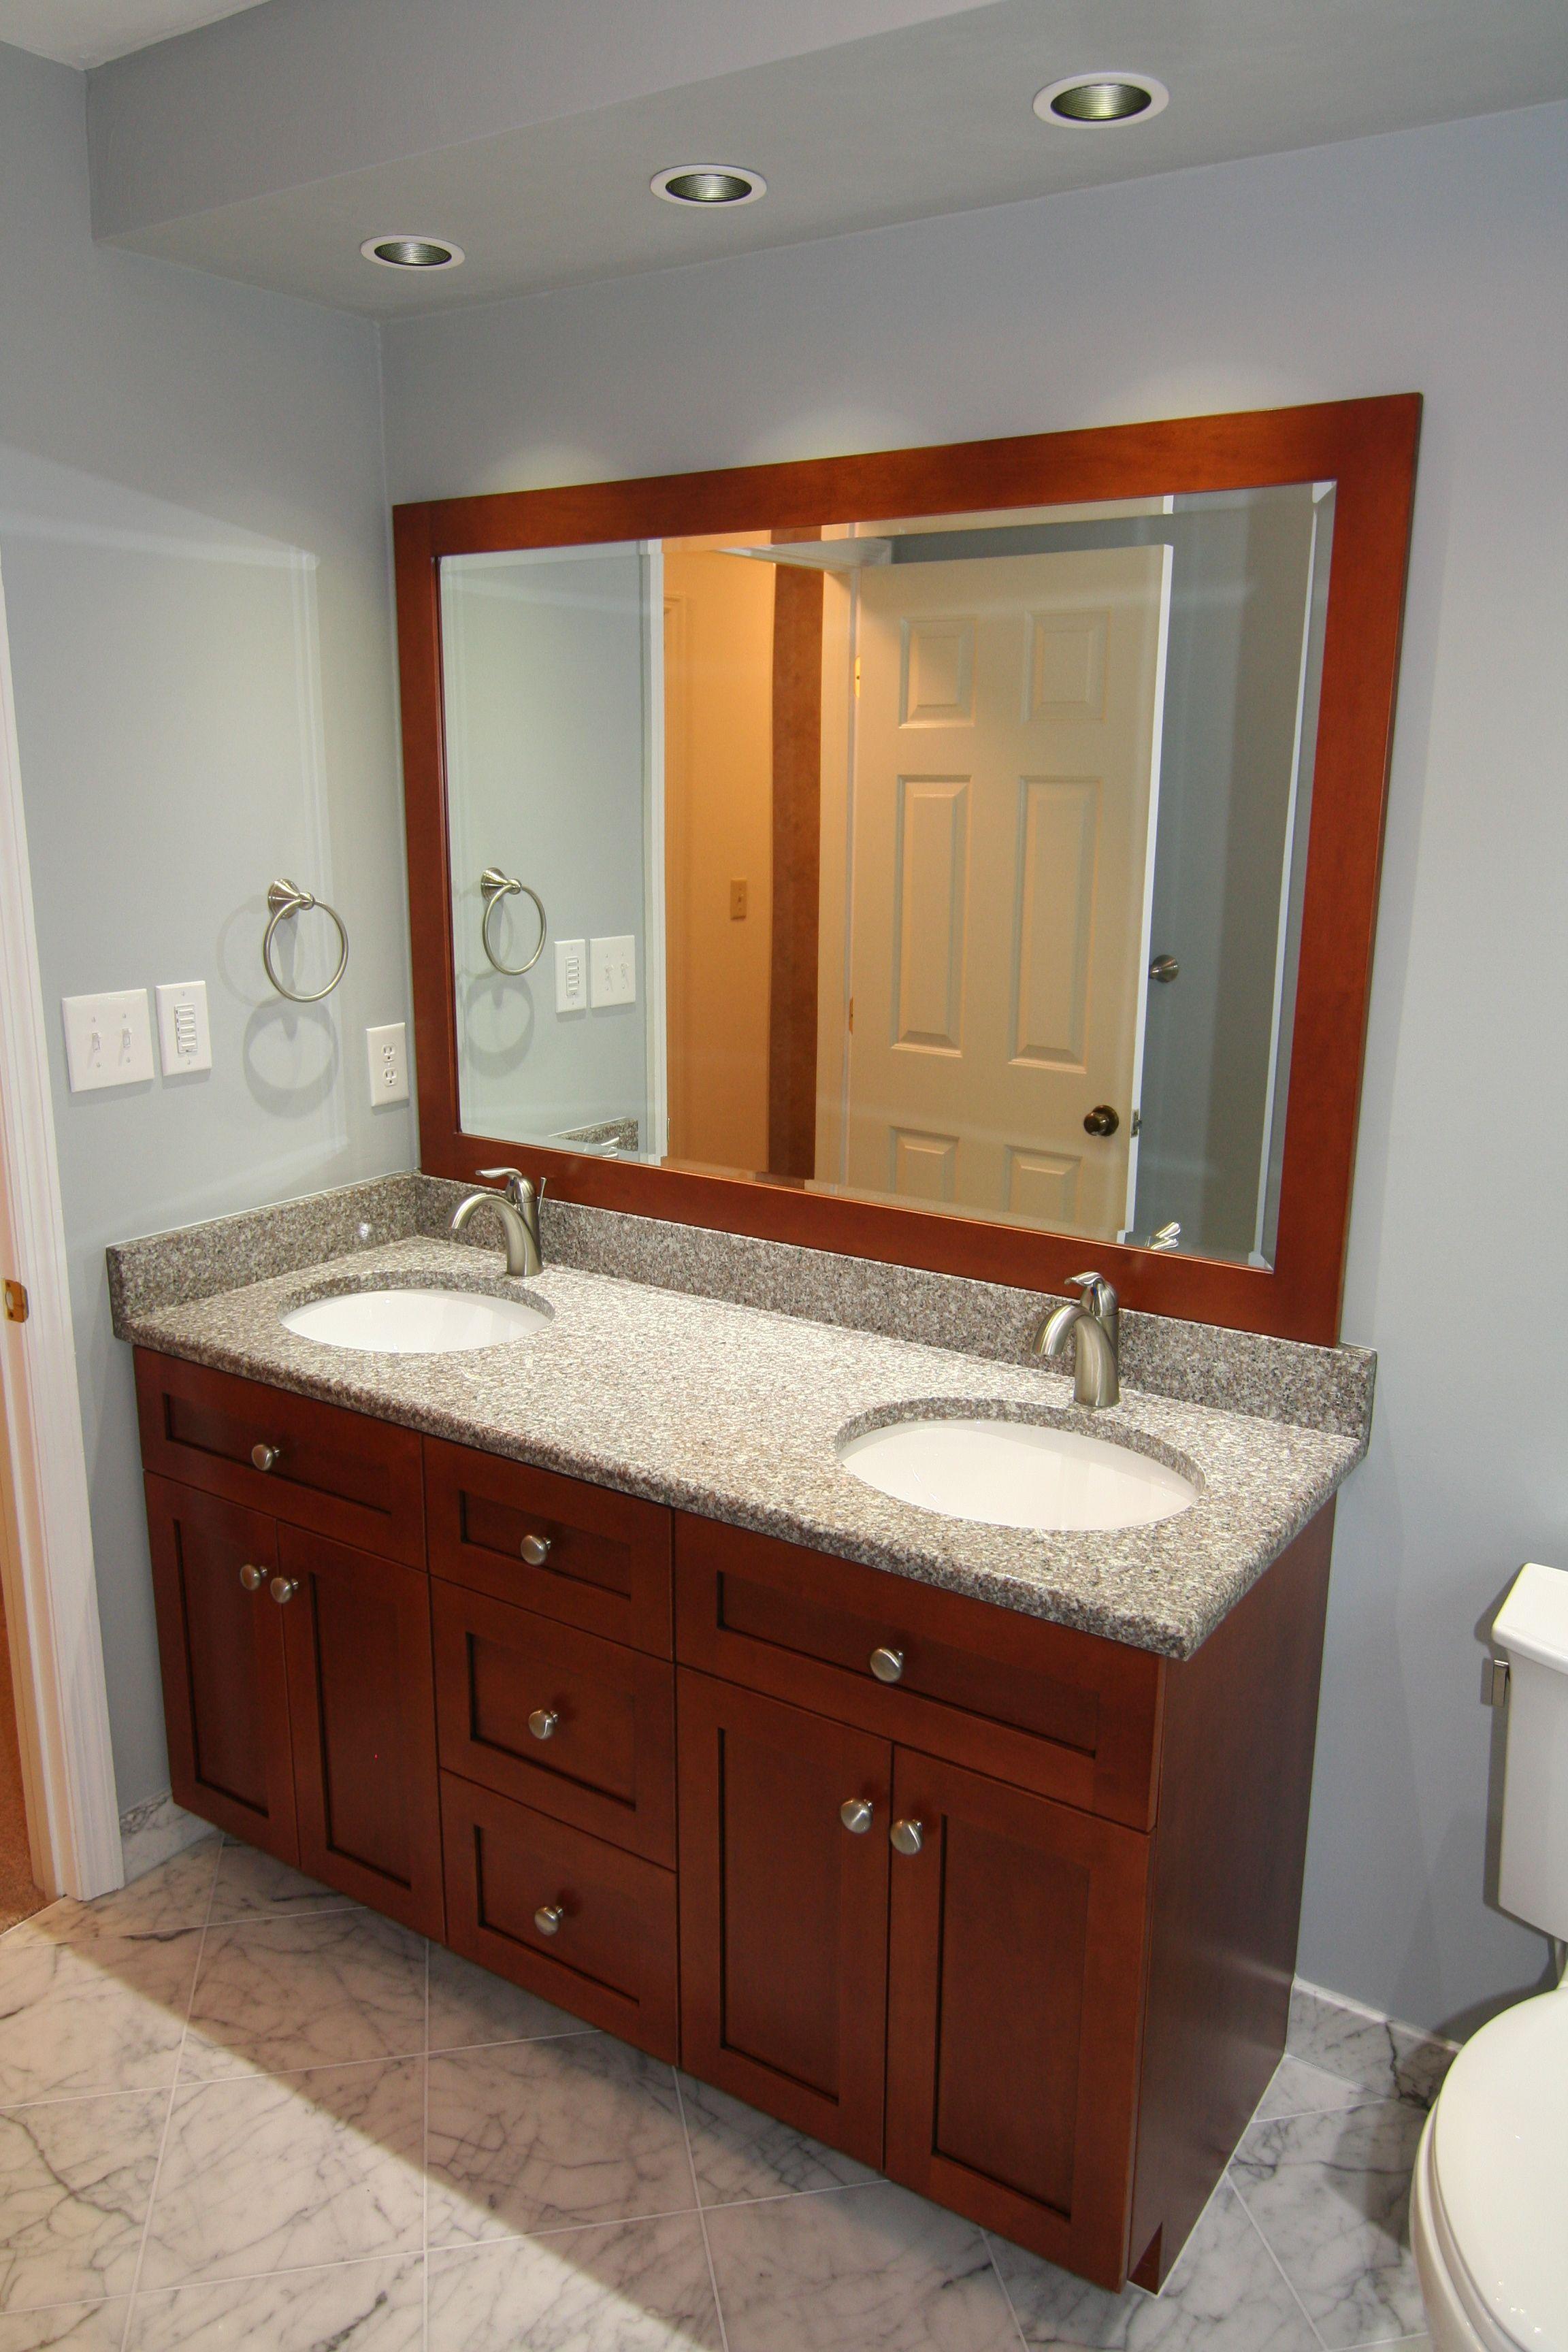 Bathroom Remodel Jack And Jill Sinks Framed Standalone Mirror